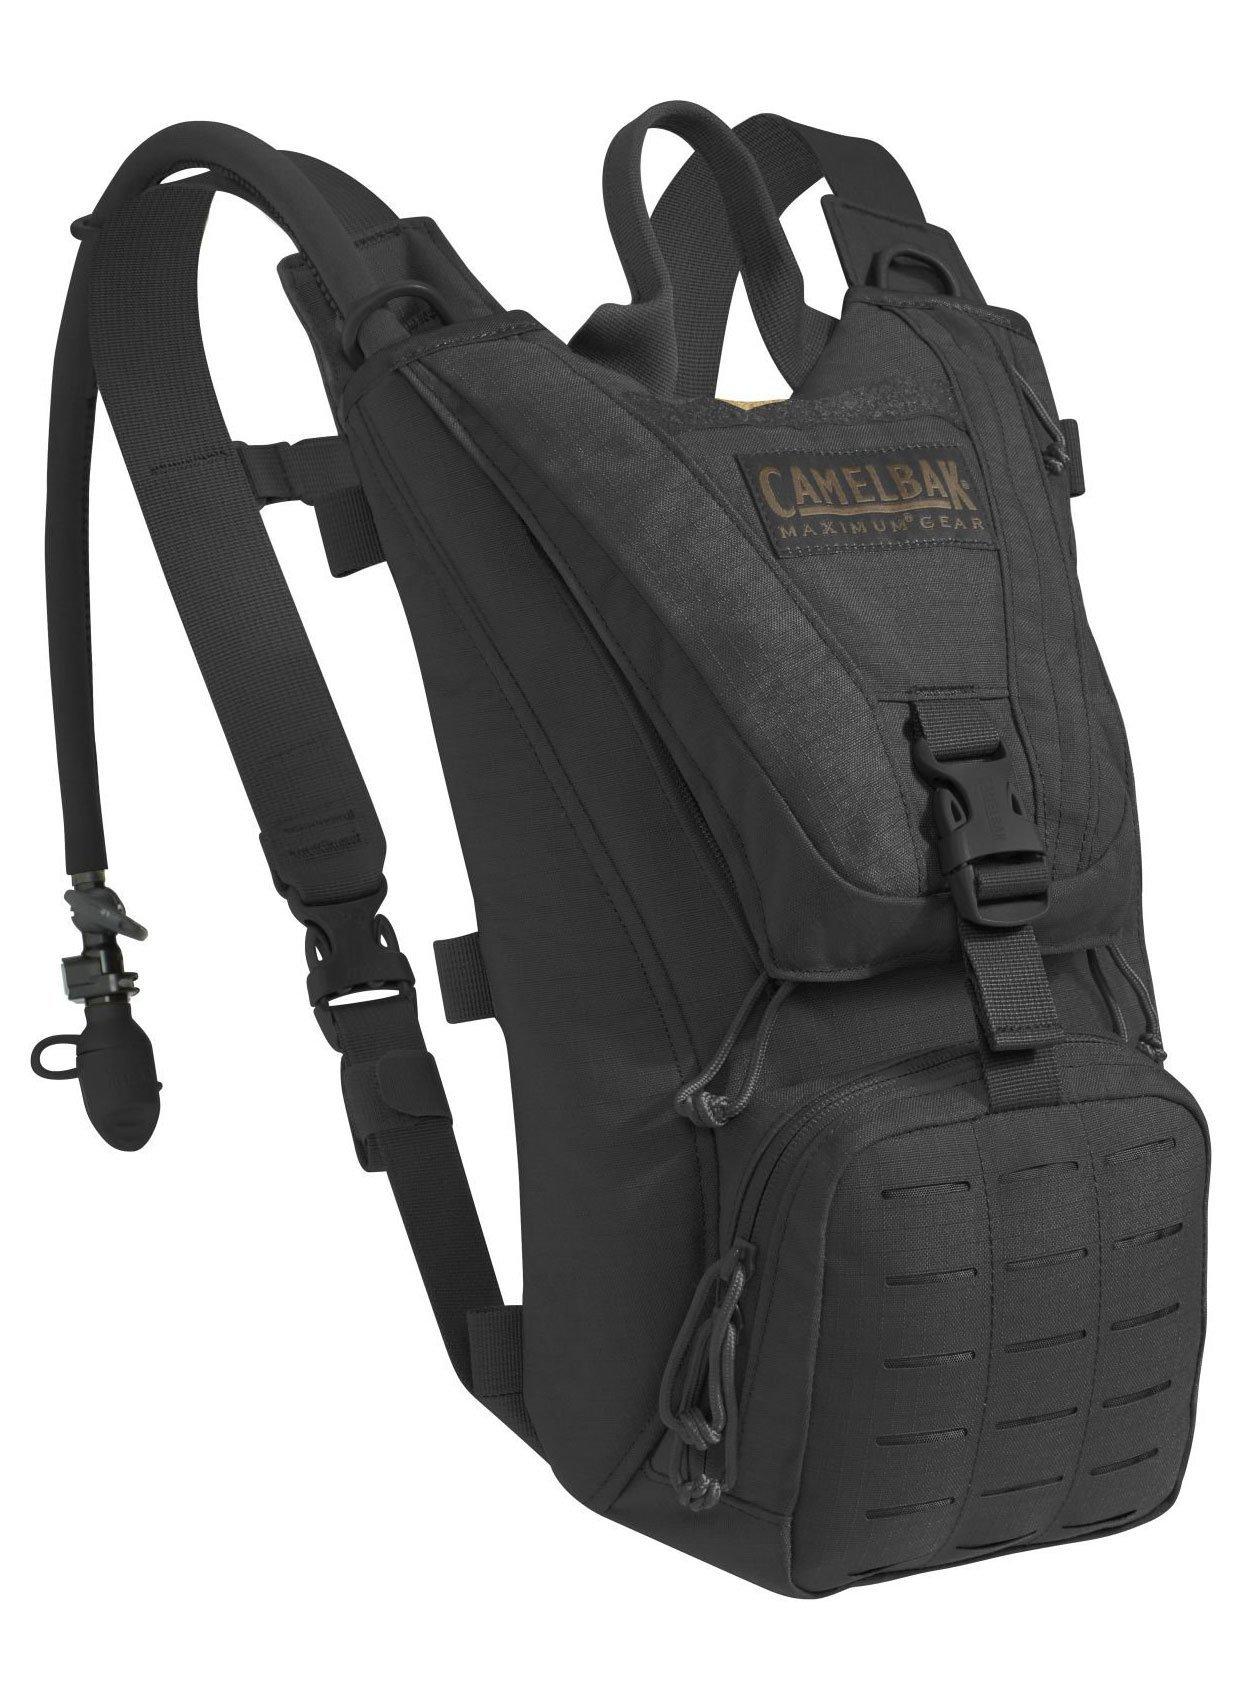 *CamelBak Ambush 62588 100oz/3L Hydration Backpack w/Mil Spec Antidote Black